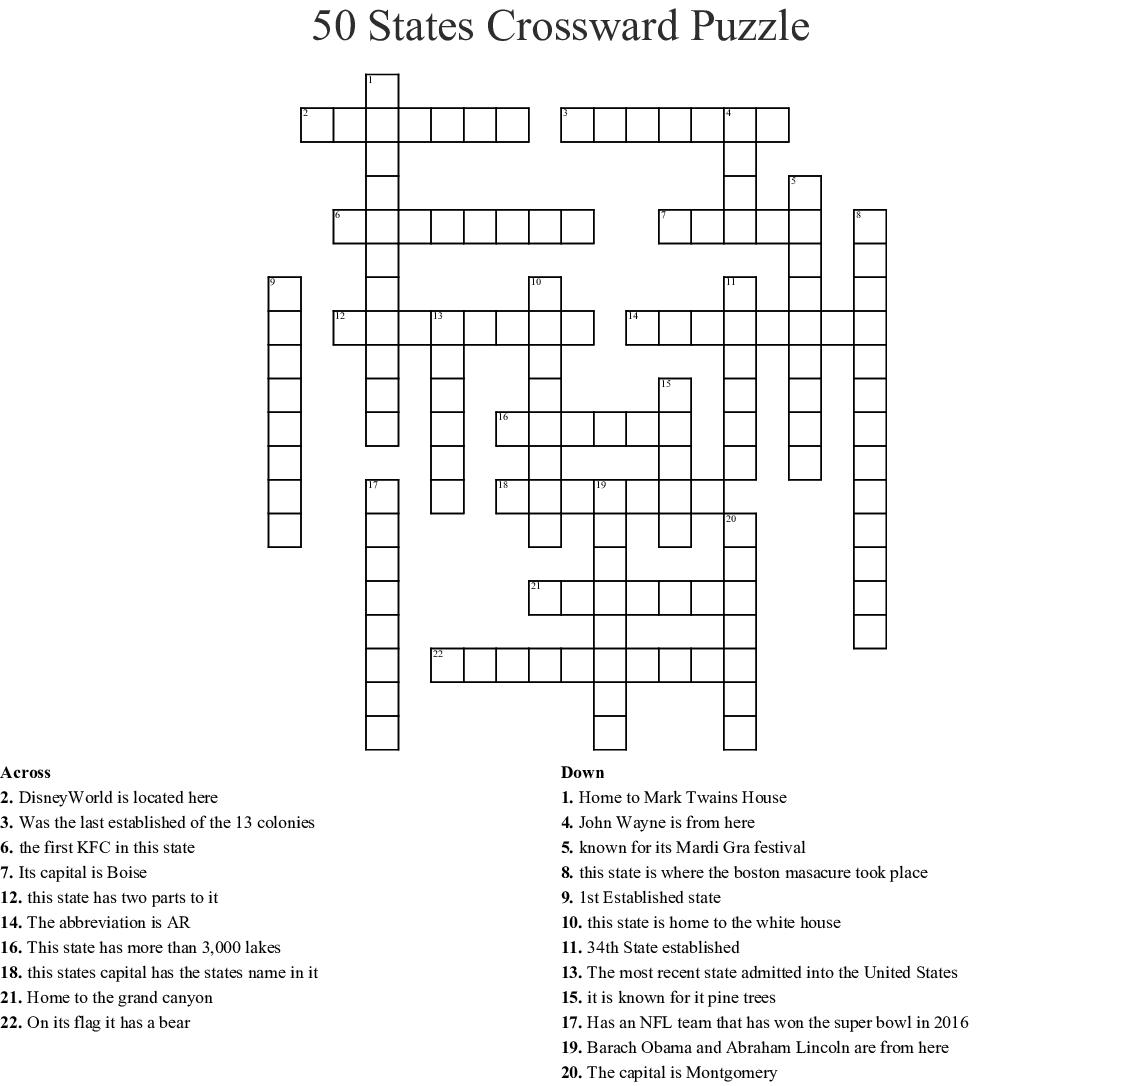 50 States Crossward Puzzle Crossword - Wordmint - 50 States Crossword Puzzle Printable